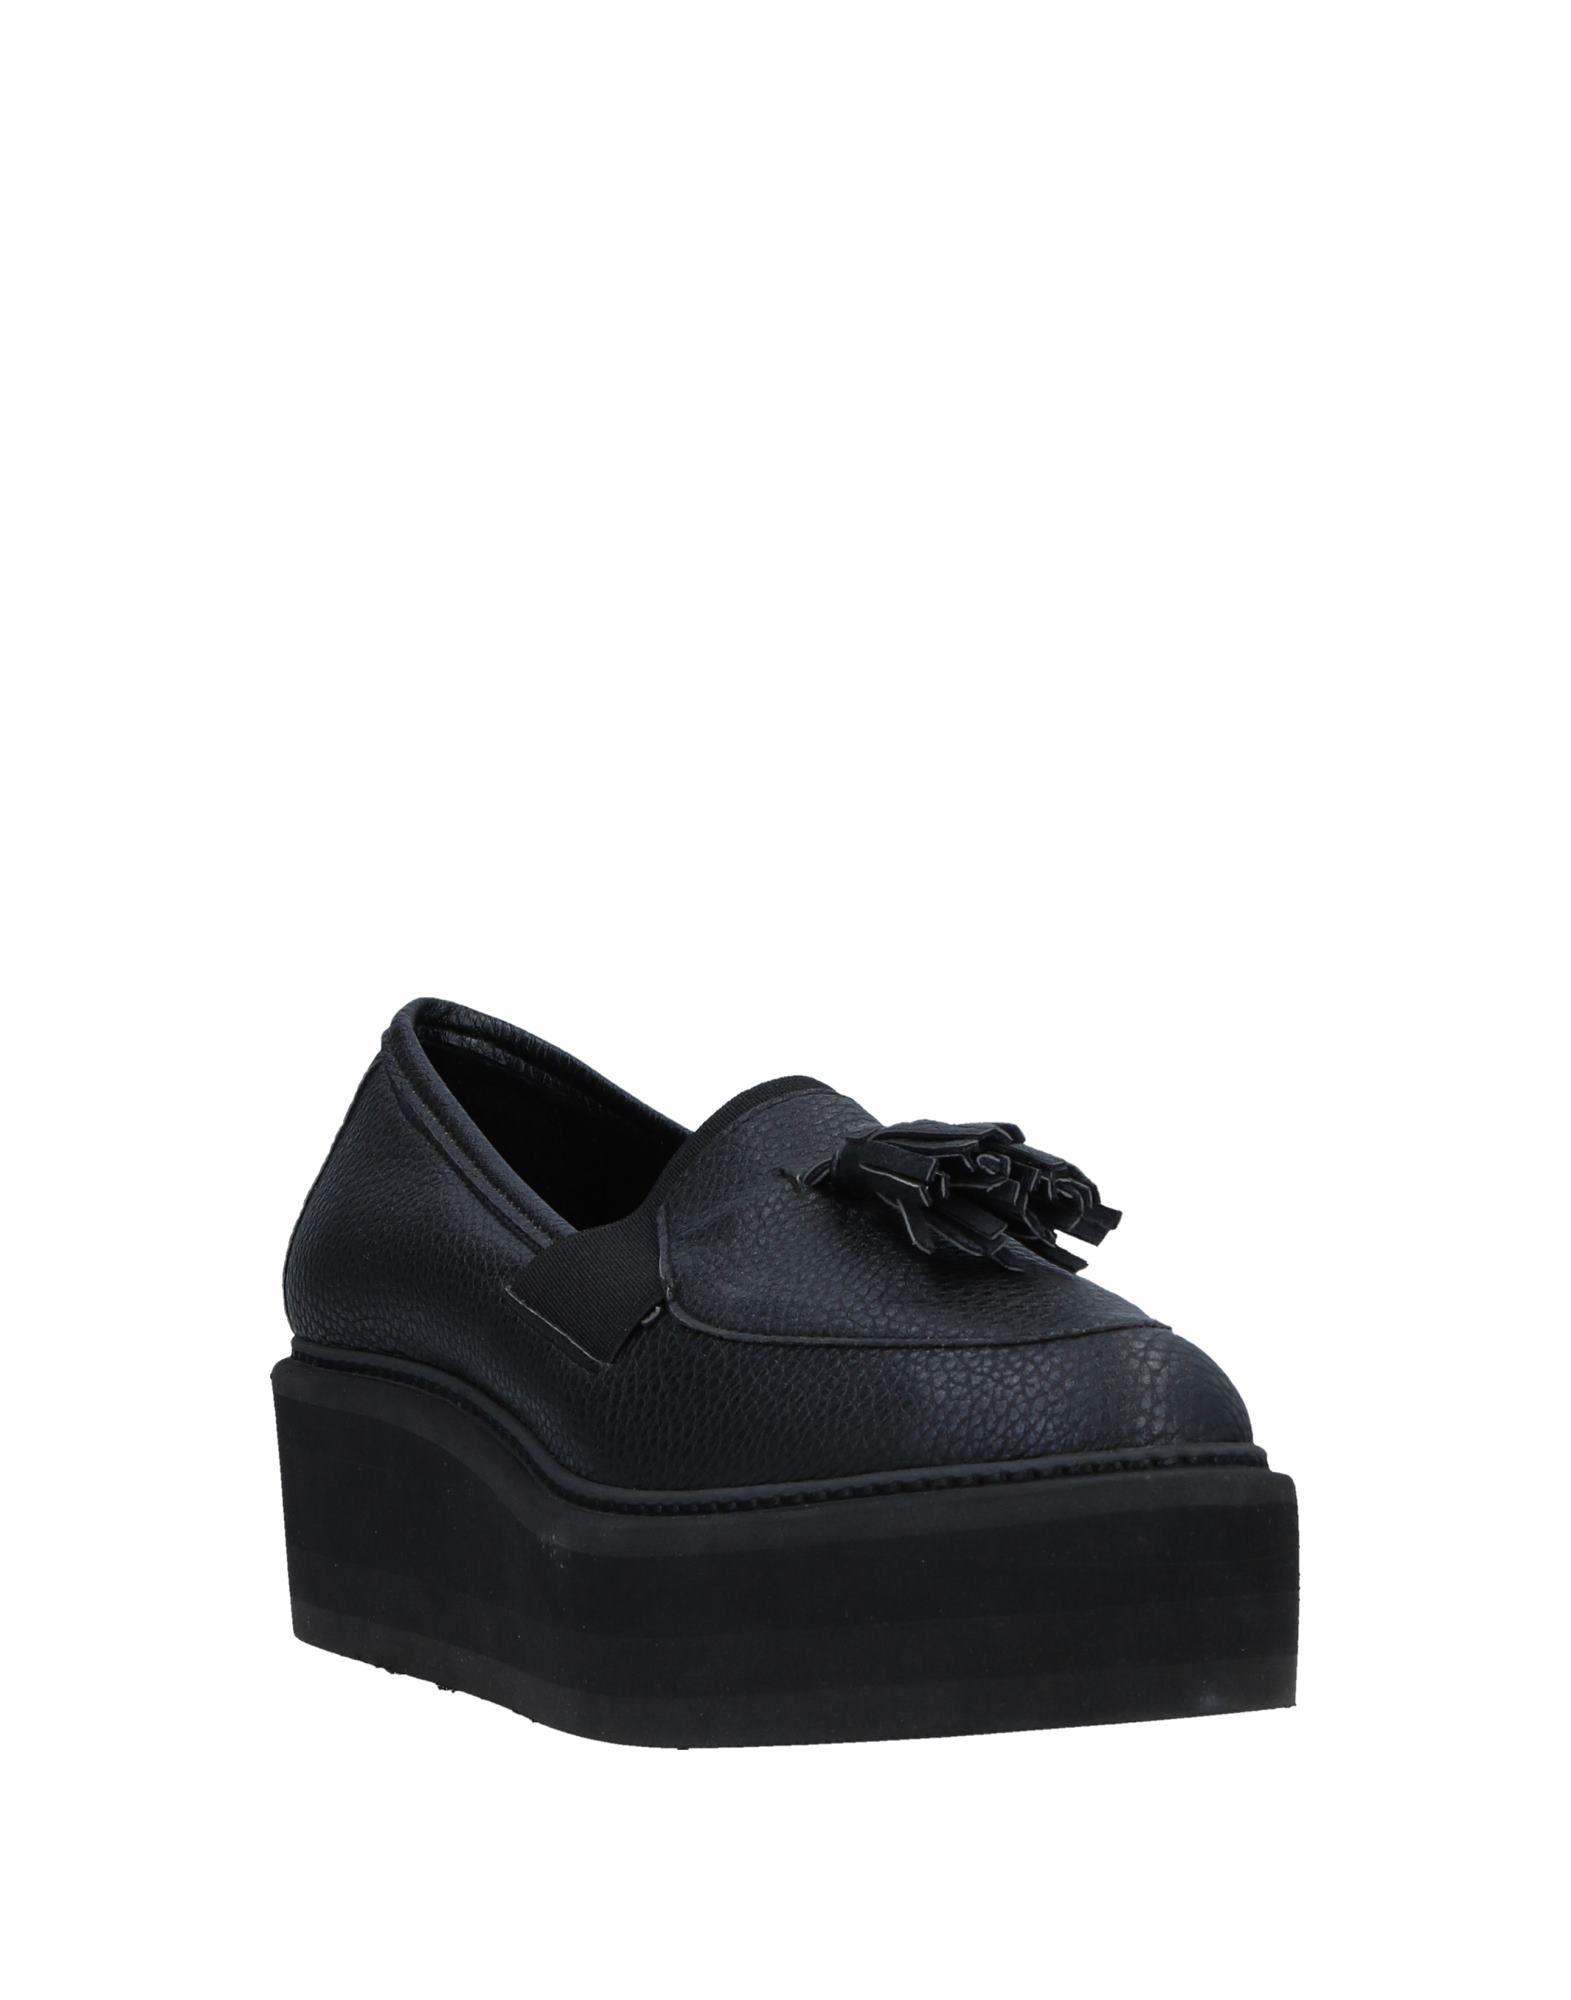 Angela George Mokassins Damen beliebte  11534049PK Gute Qualität beliebte Damen Schuhe af8031